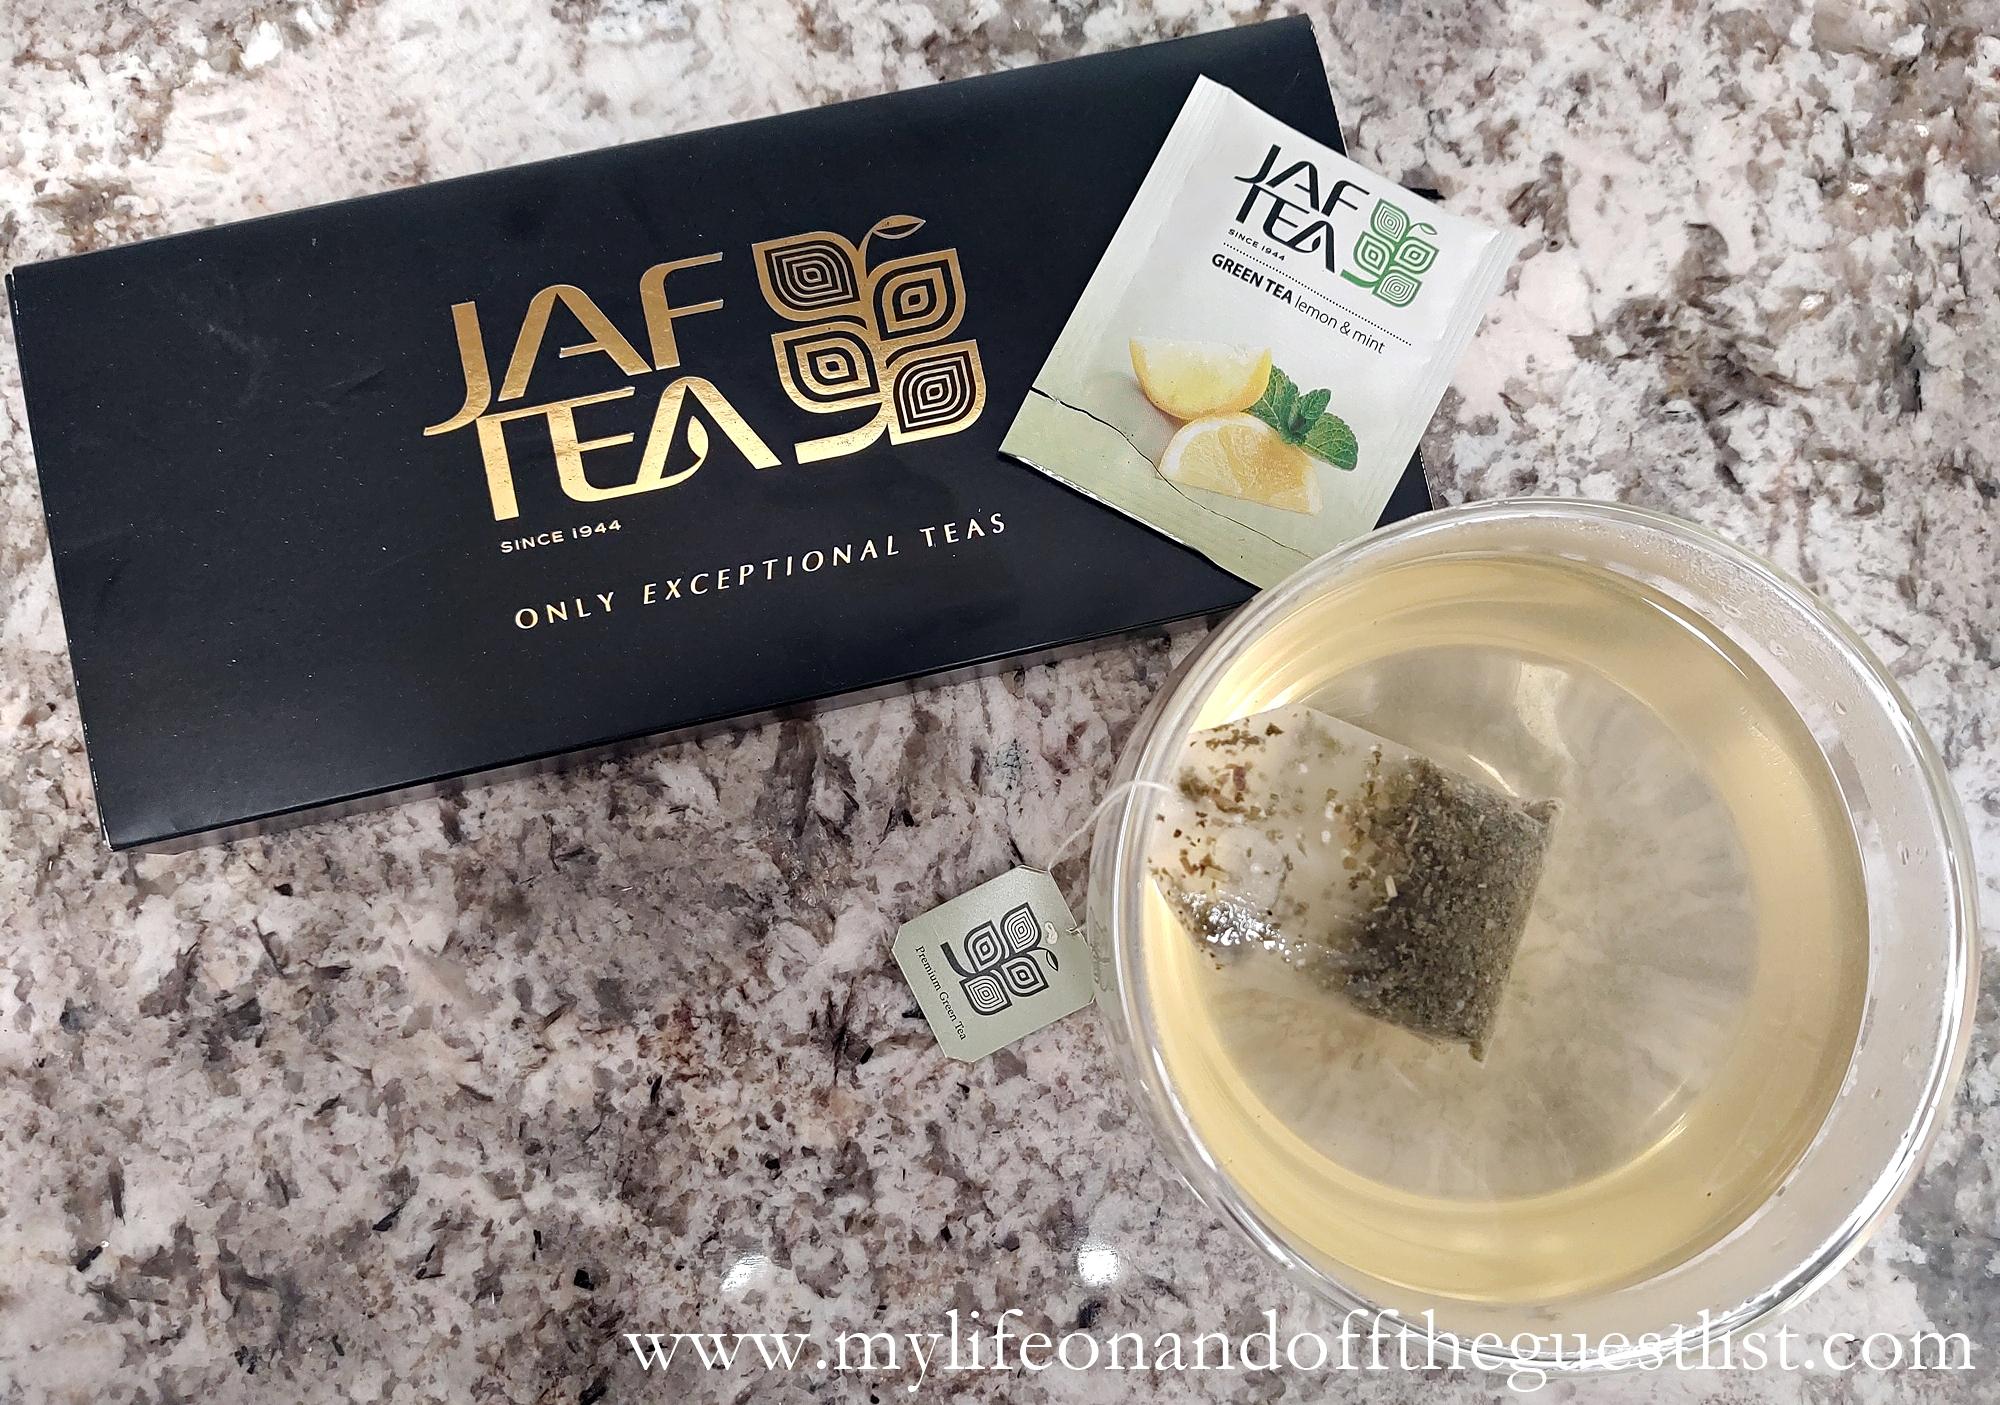 Drink to Your Health: JAF TEA Artisanal Handpicked Teas